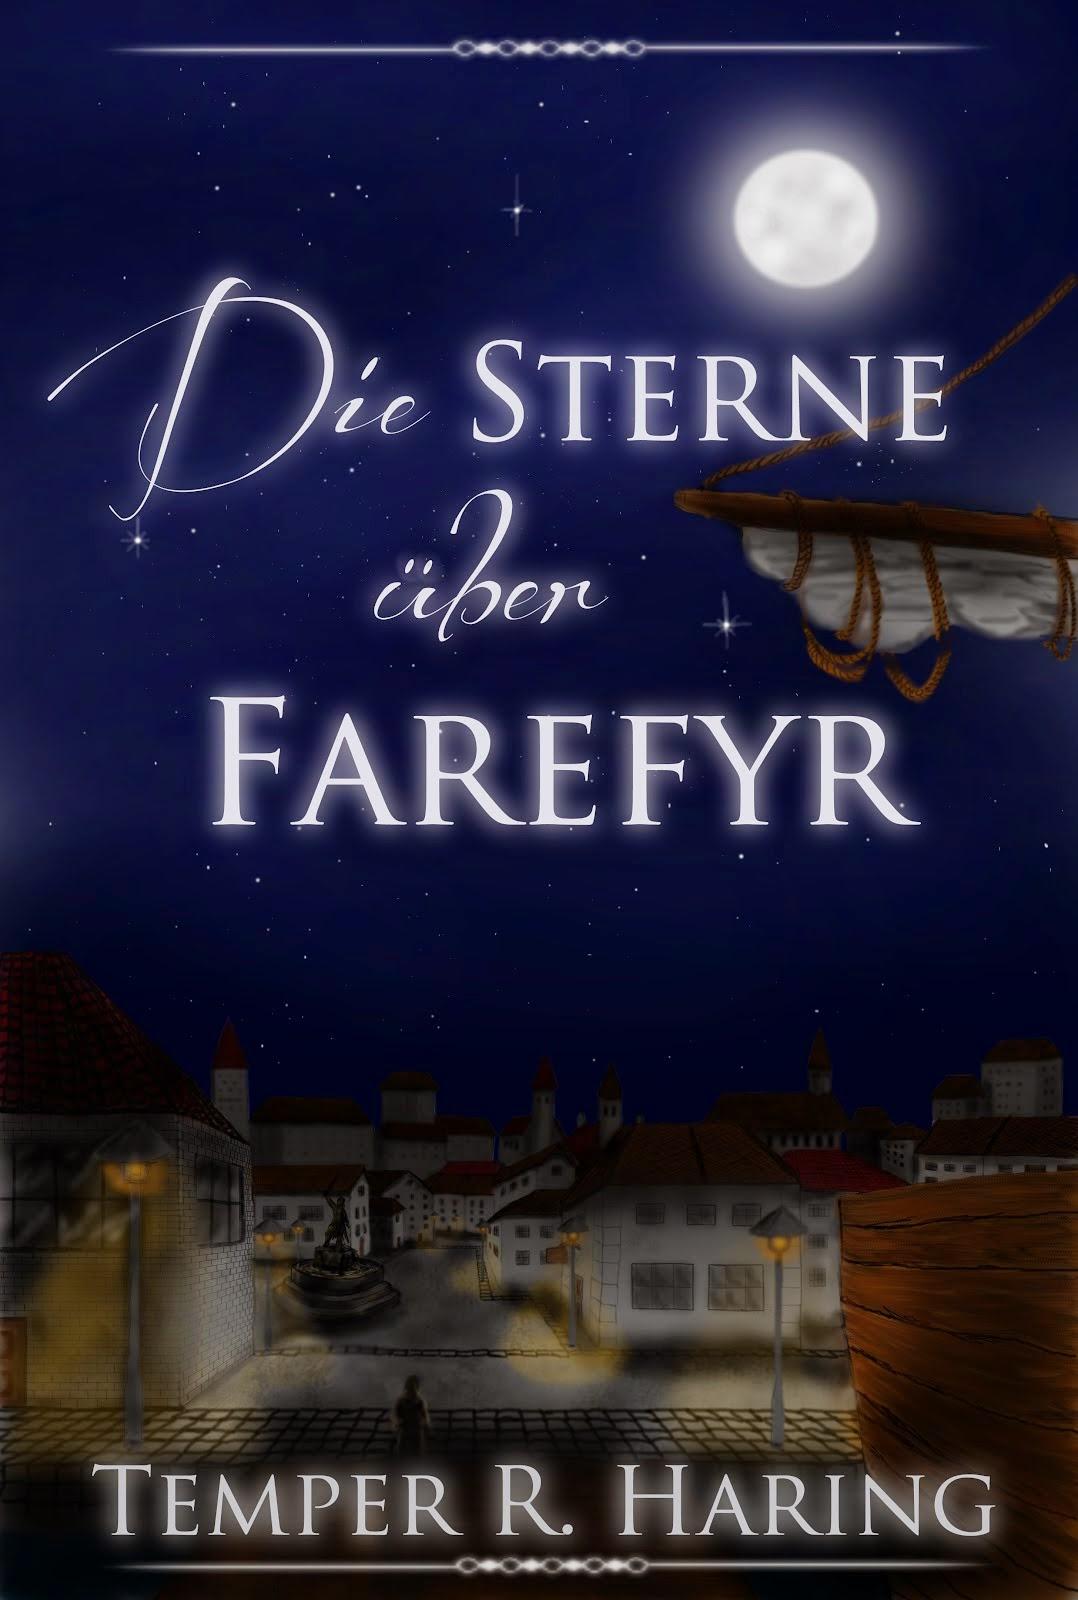 http://www.amazon.de/Sterne-%C3%BCber-Farefyr-Temper-Haring-ebook/dp/B00MKGKRA0/ref=sr_1_1?s=digital-text&ie=UTF8&qid=1407704426&sr=1-1&keywords=die+sterne+%C3%BCber+farefyr